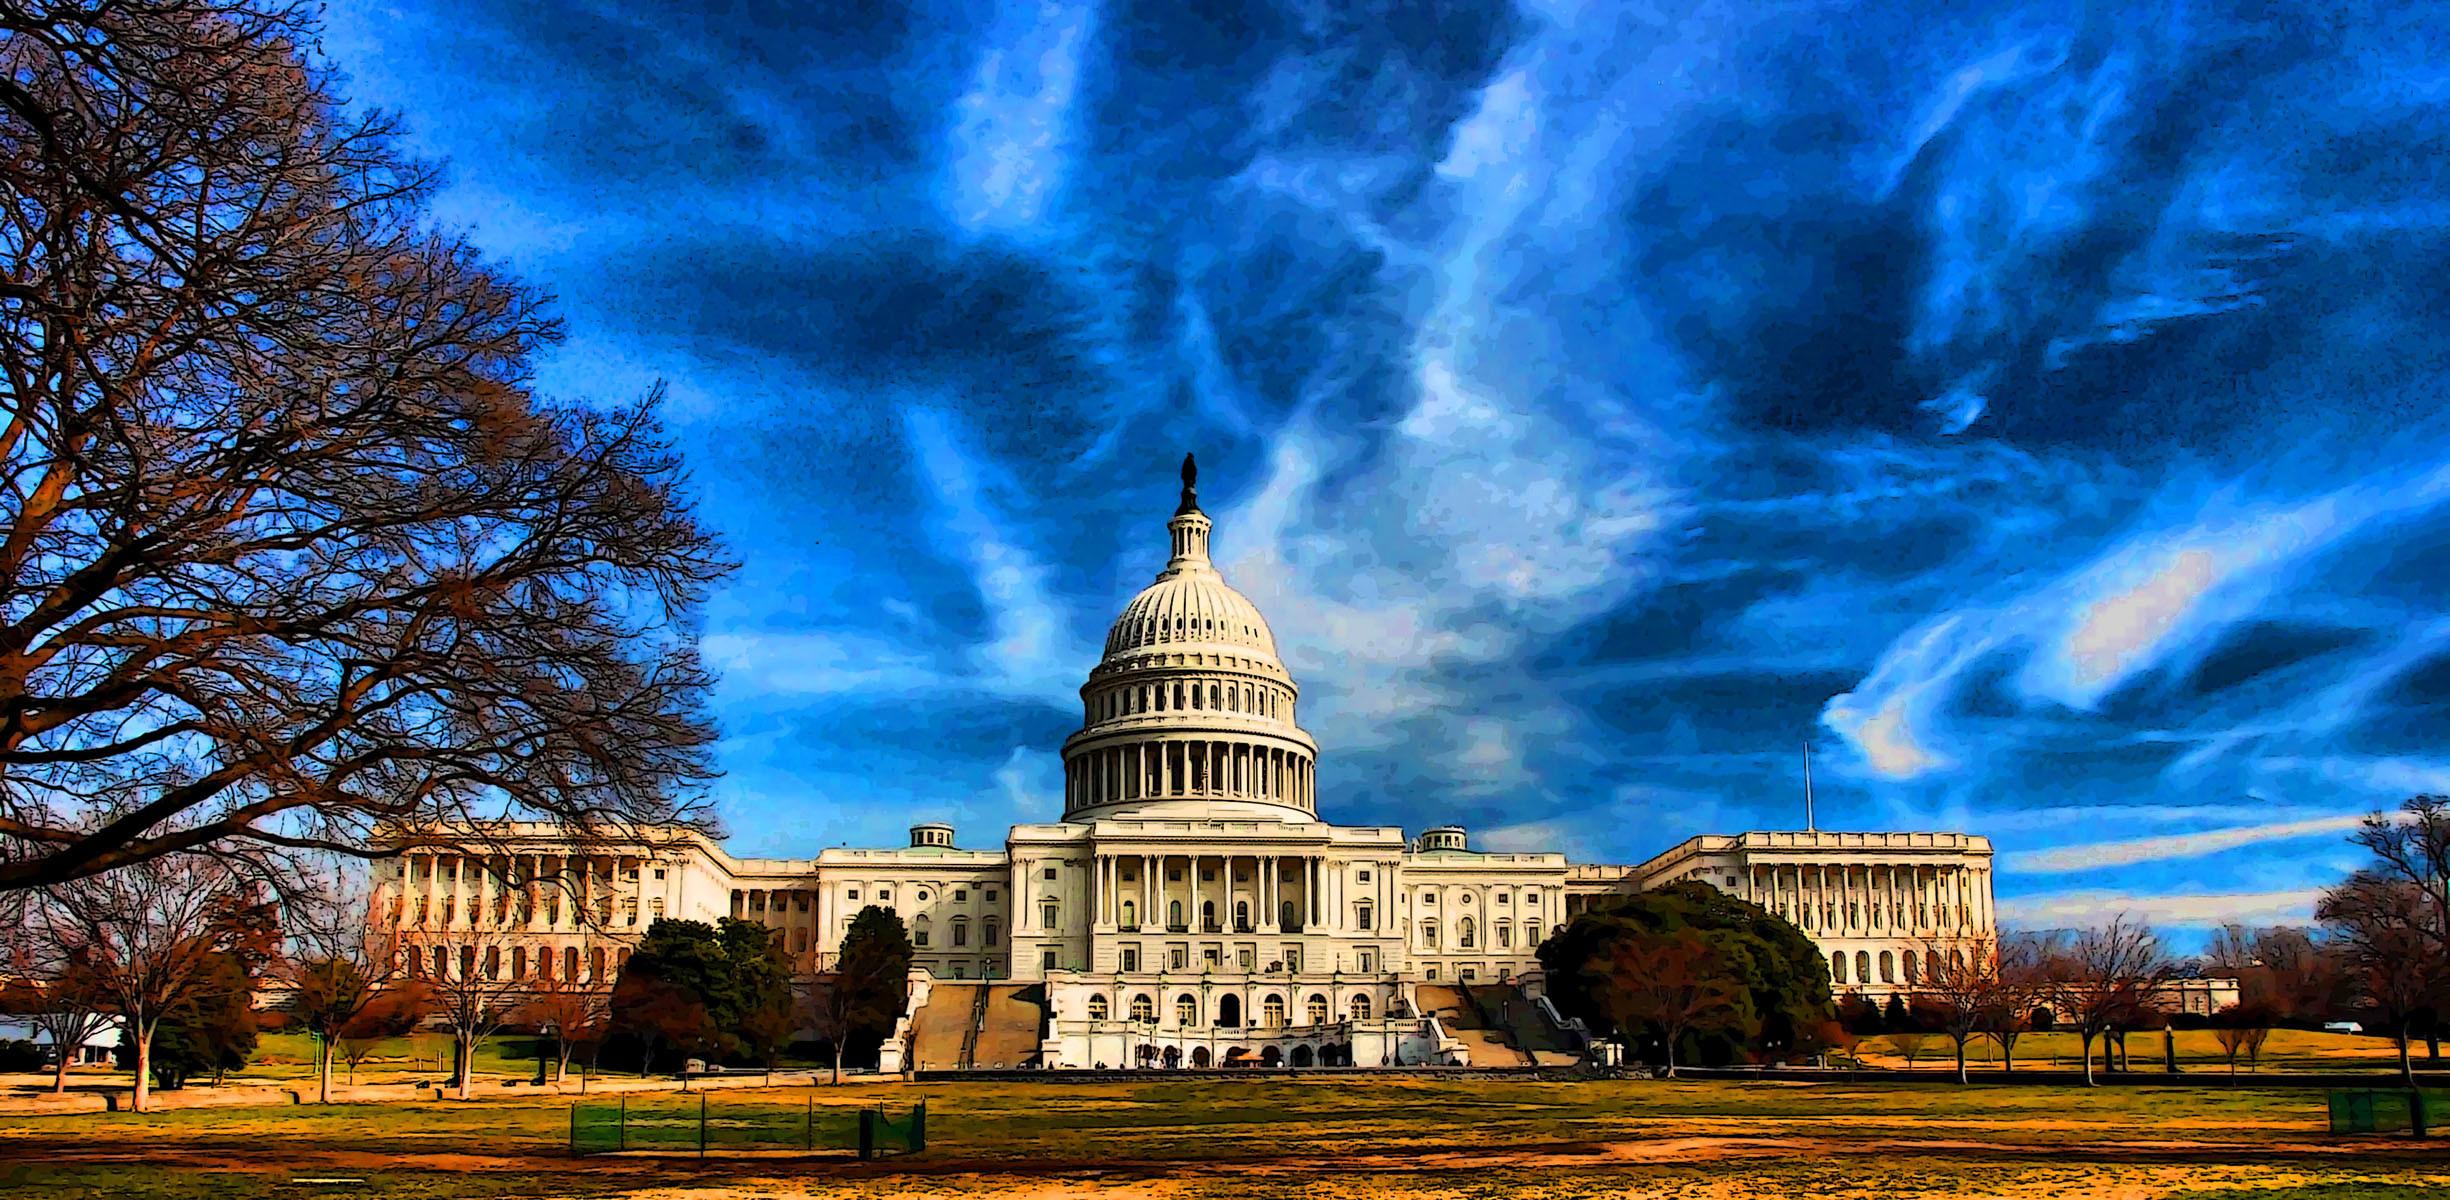 Washington-wallpapers-5.jpg